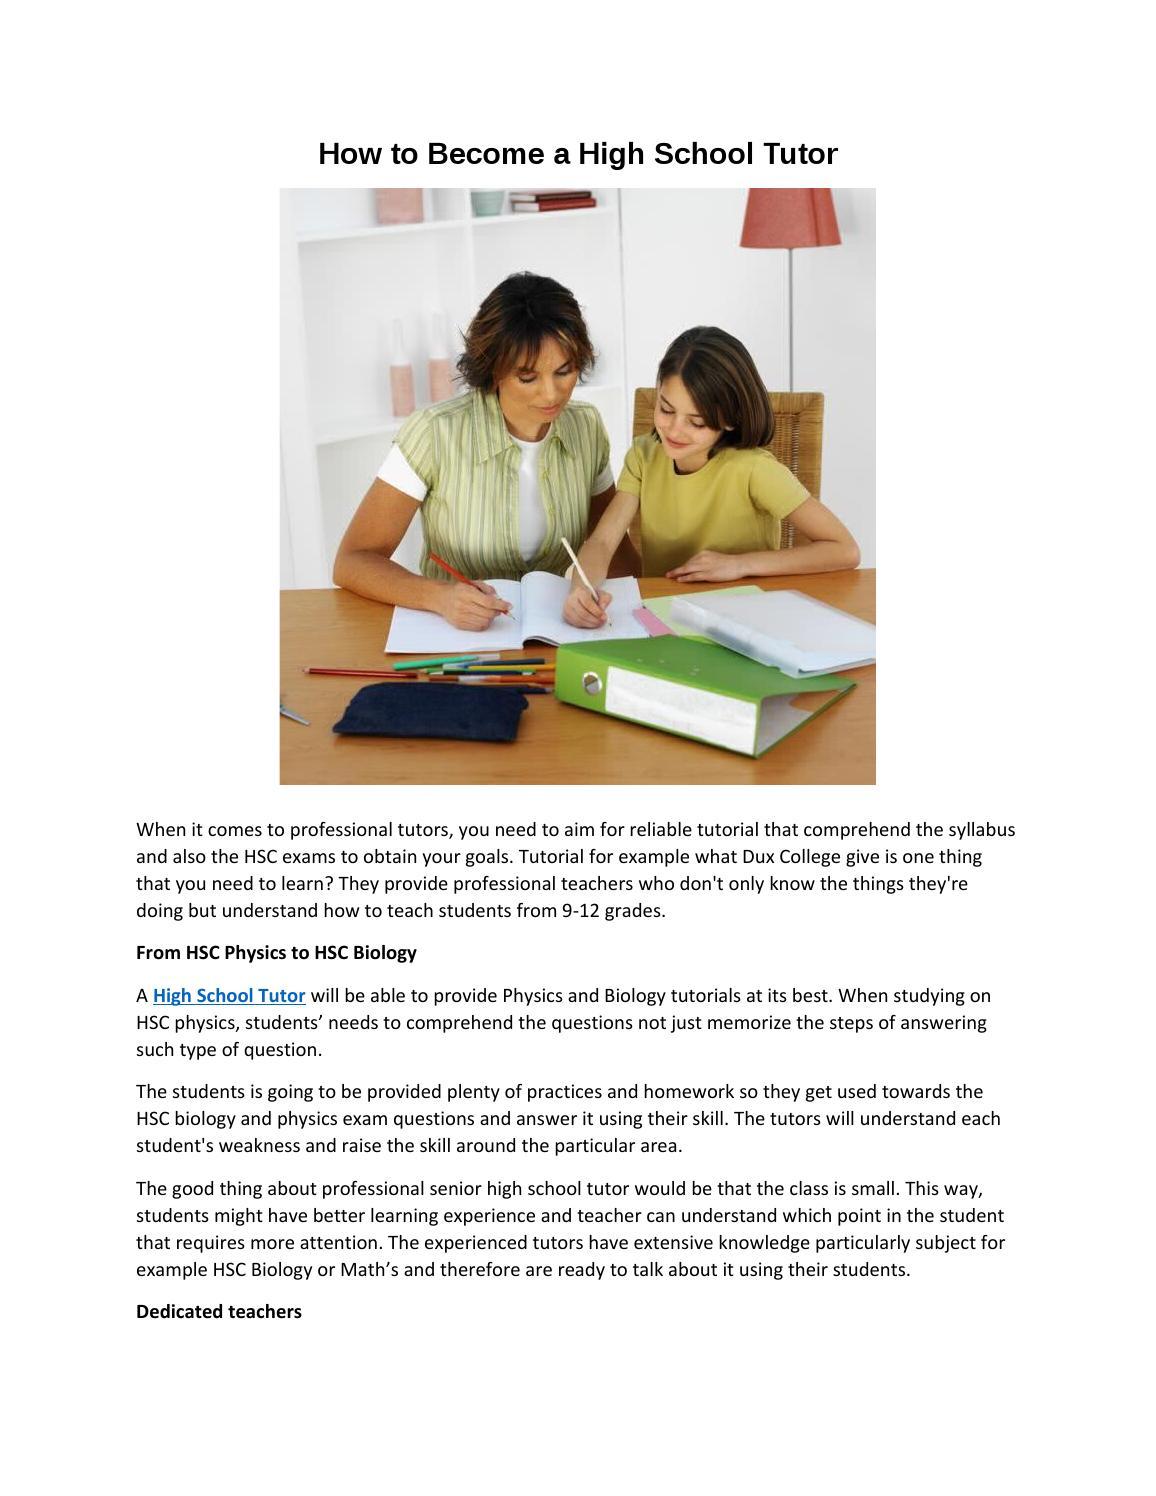 How to become a high school tutor by highschooltutors - issuu